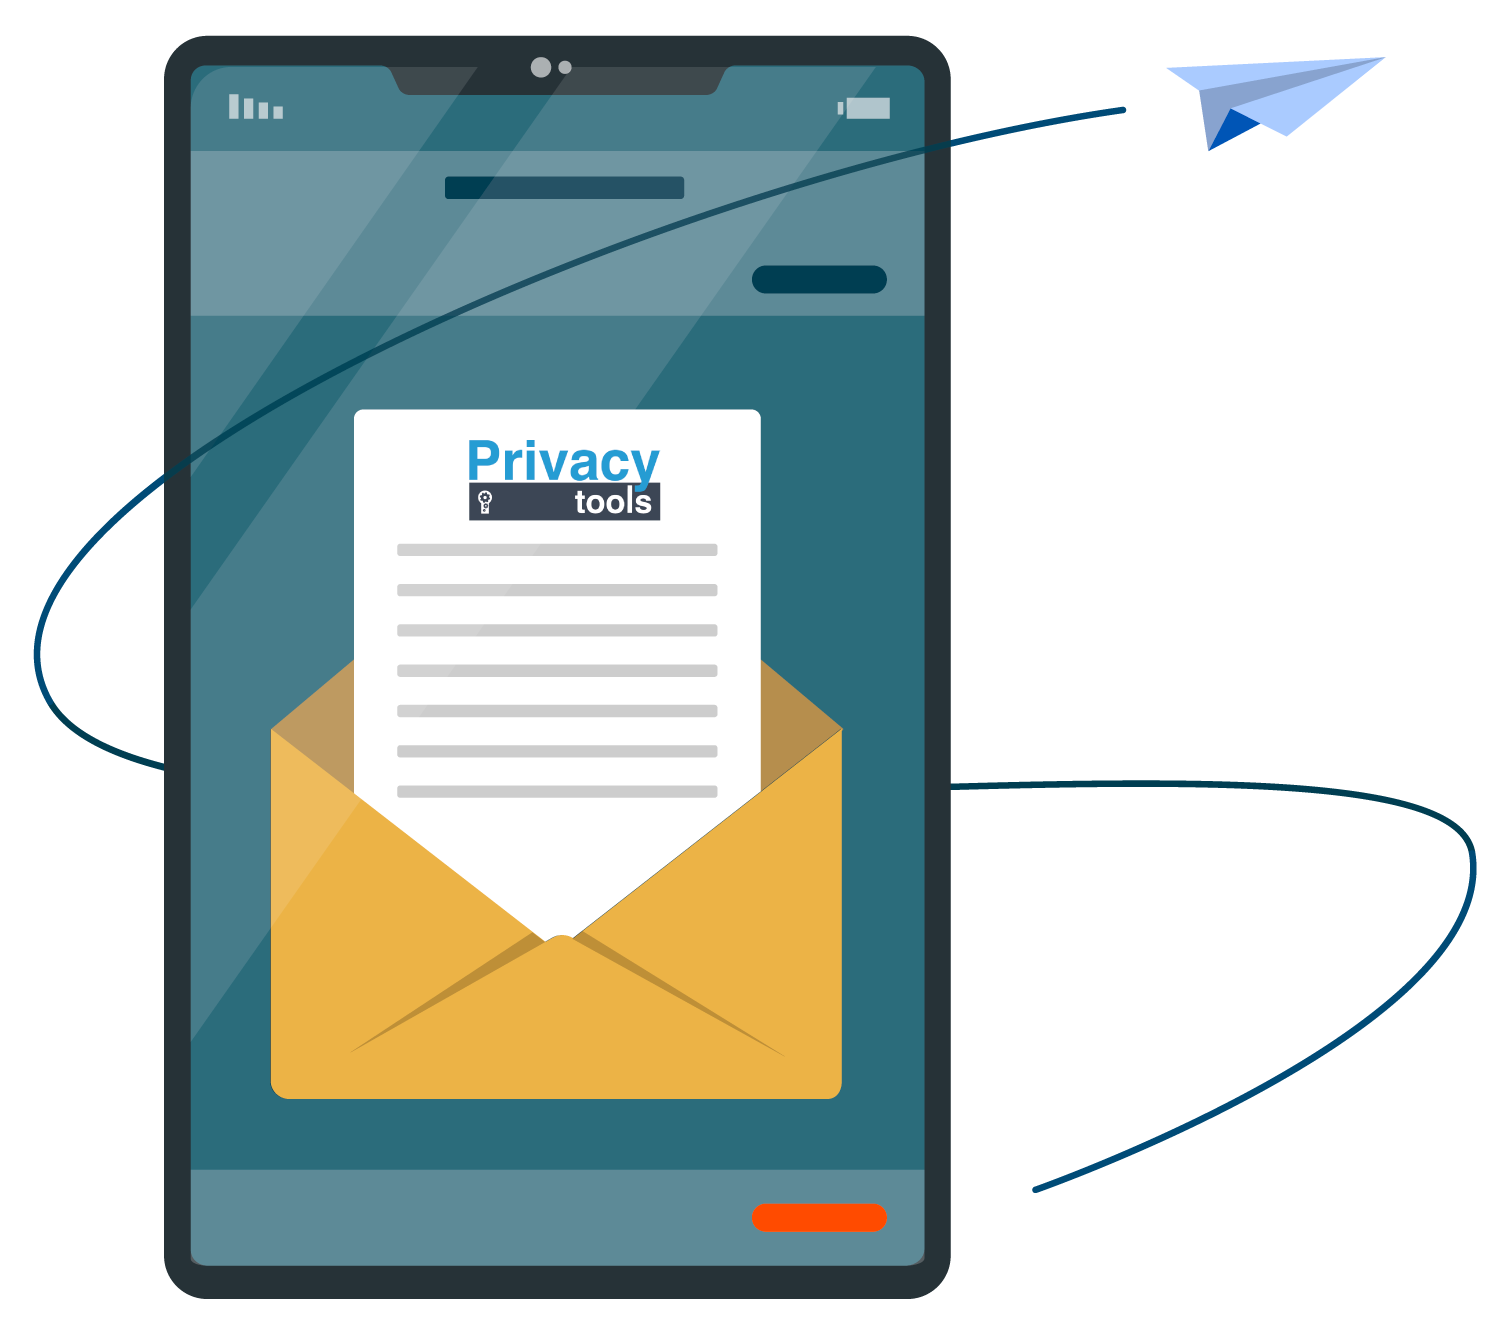 PrivacyTools - LGPD - Privacidade